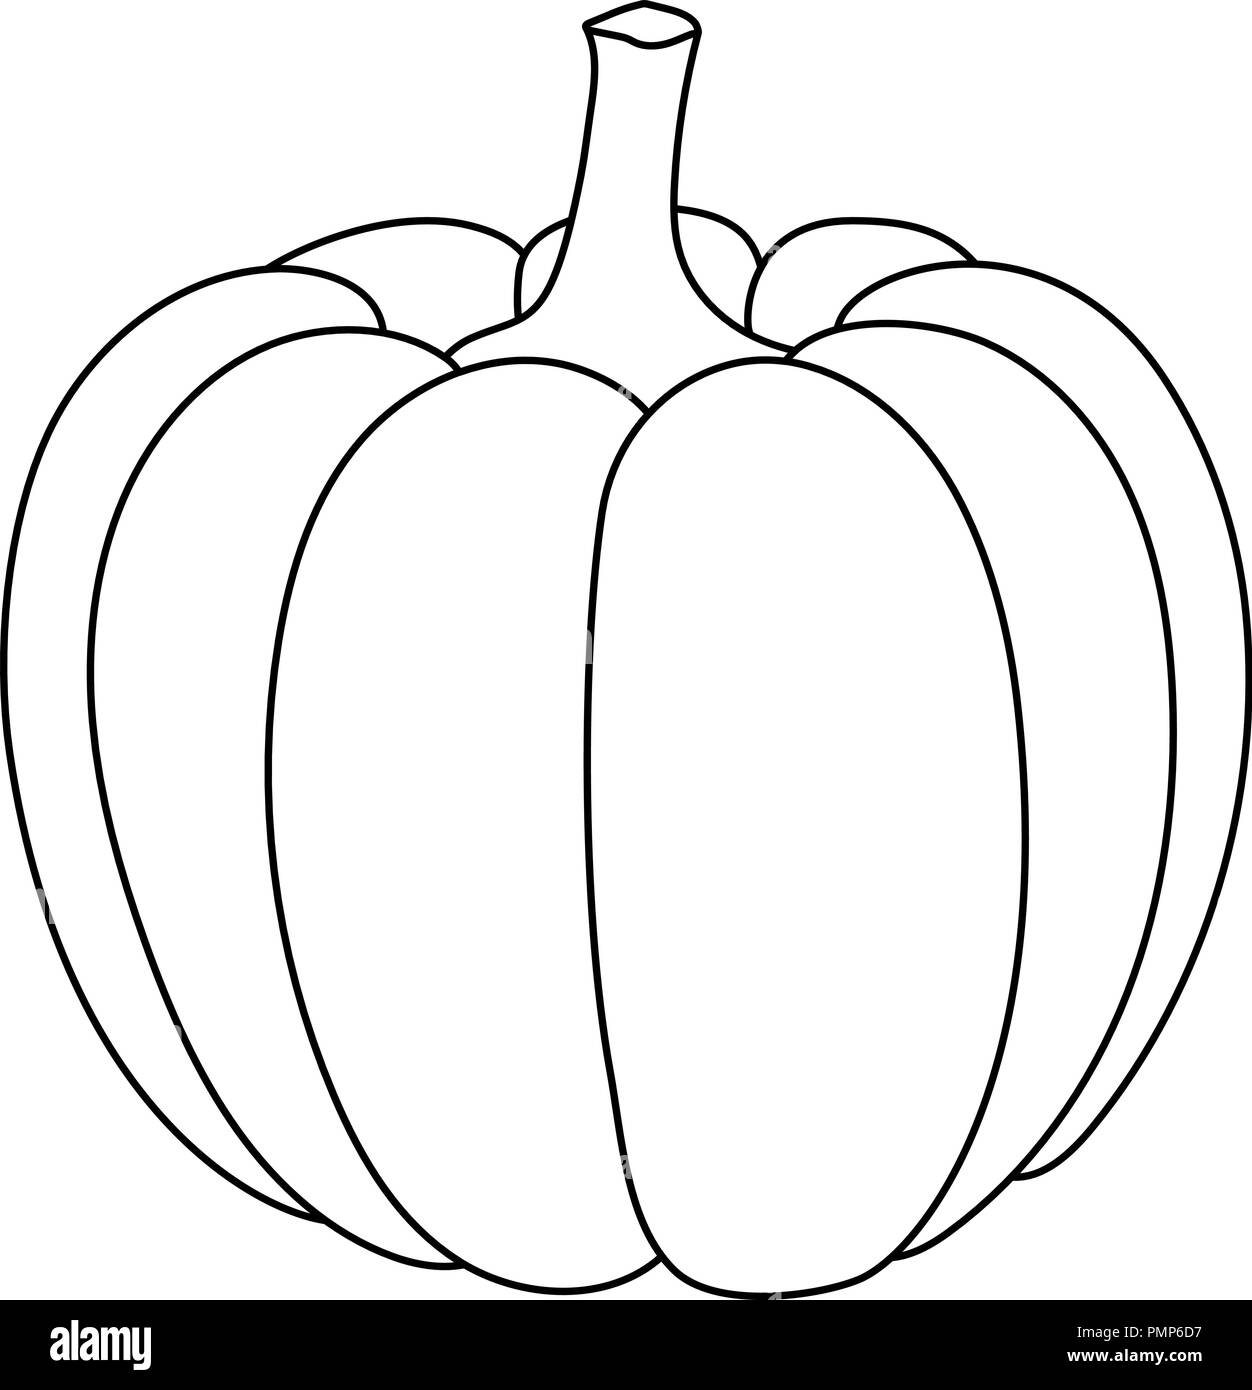 Pumpkin Outline Doodle Stock Vector Image Art Alamy